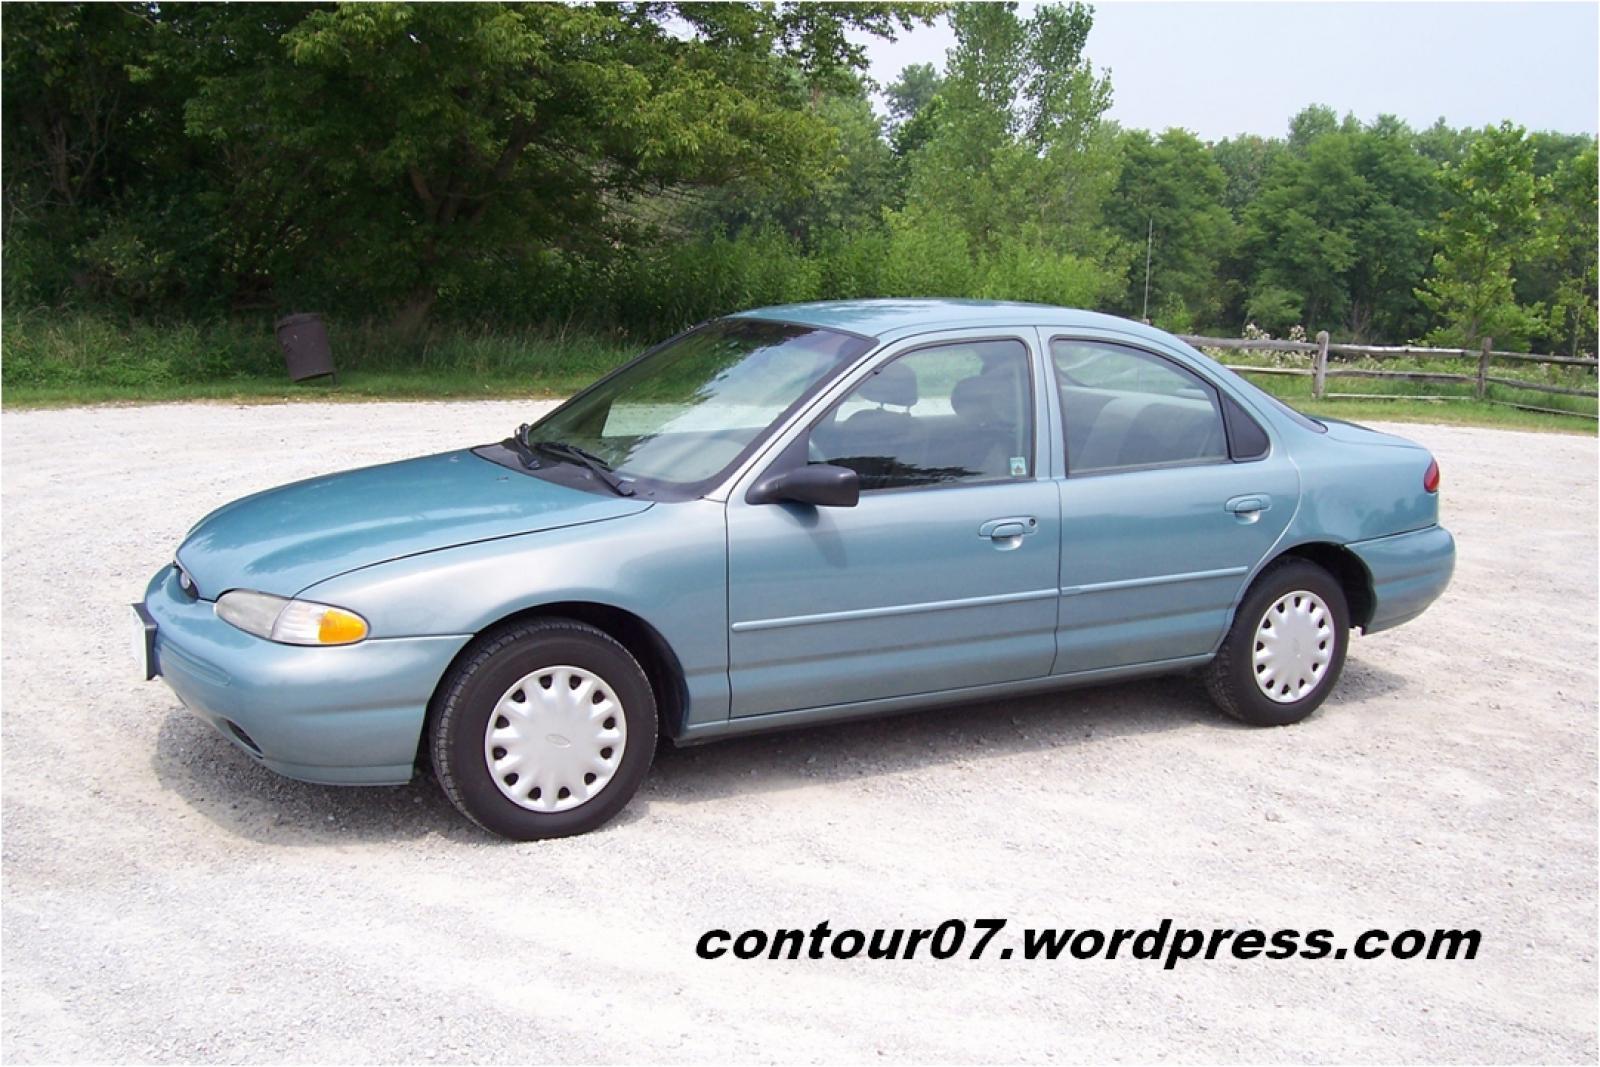 800 1024 1280 1600 origin 1997 ford contour